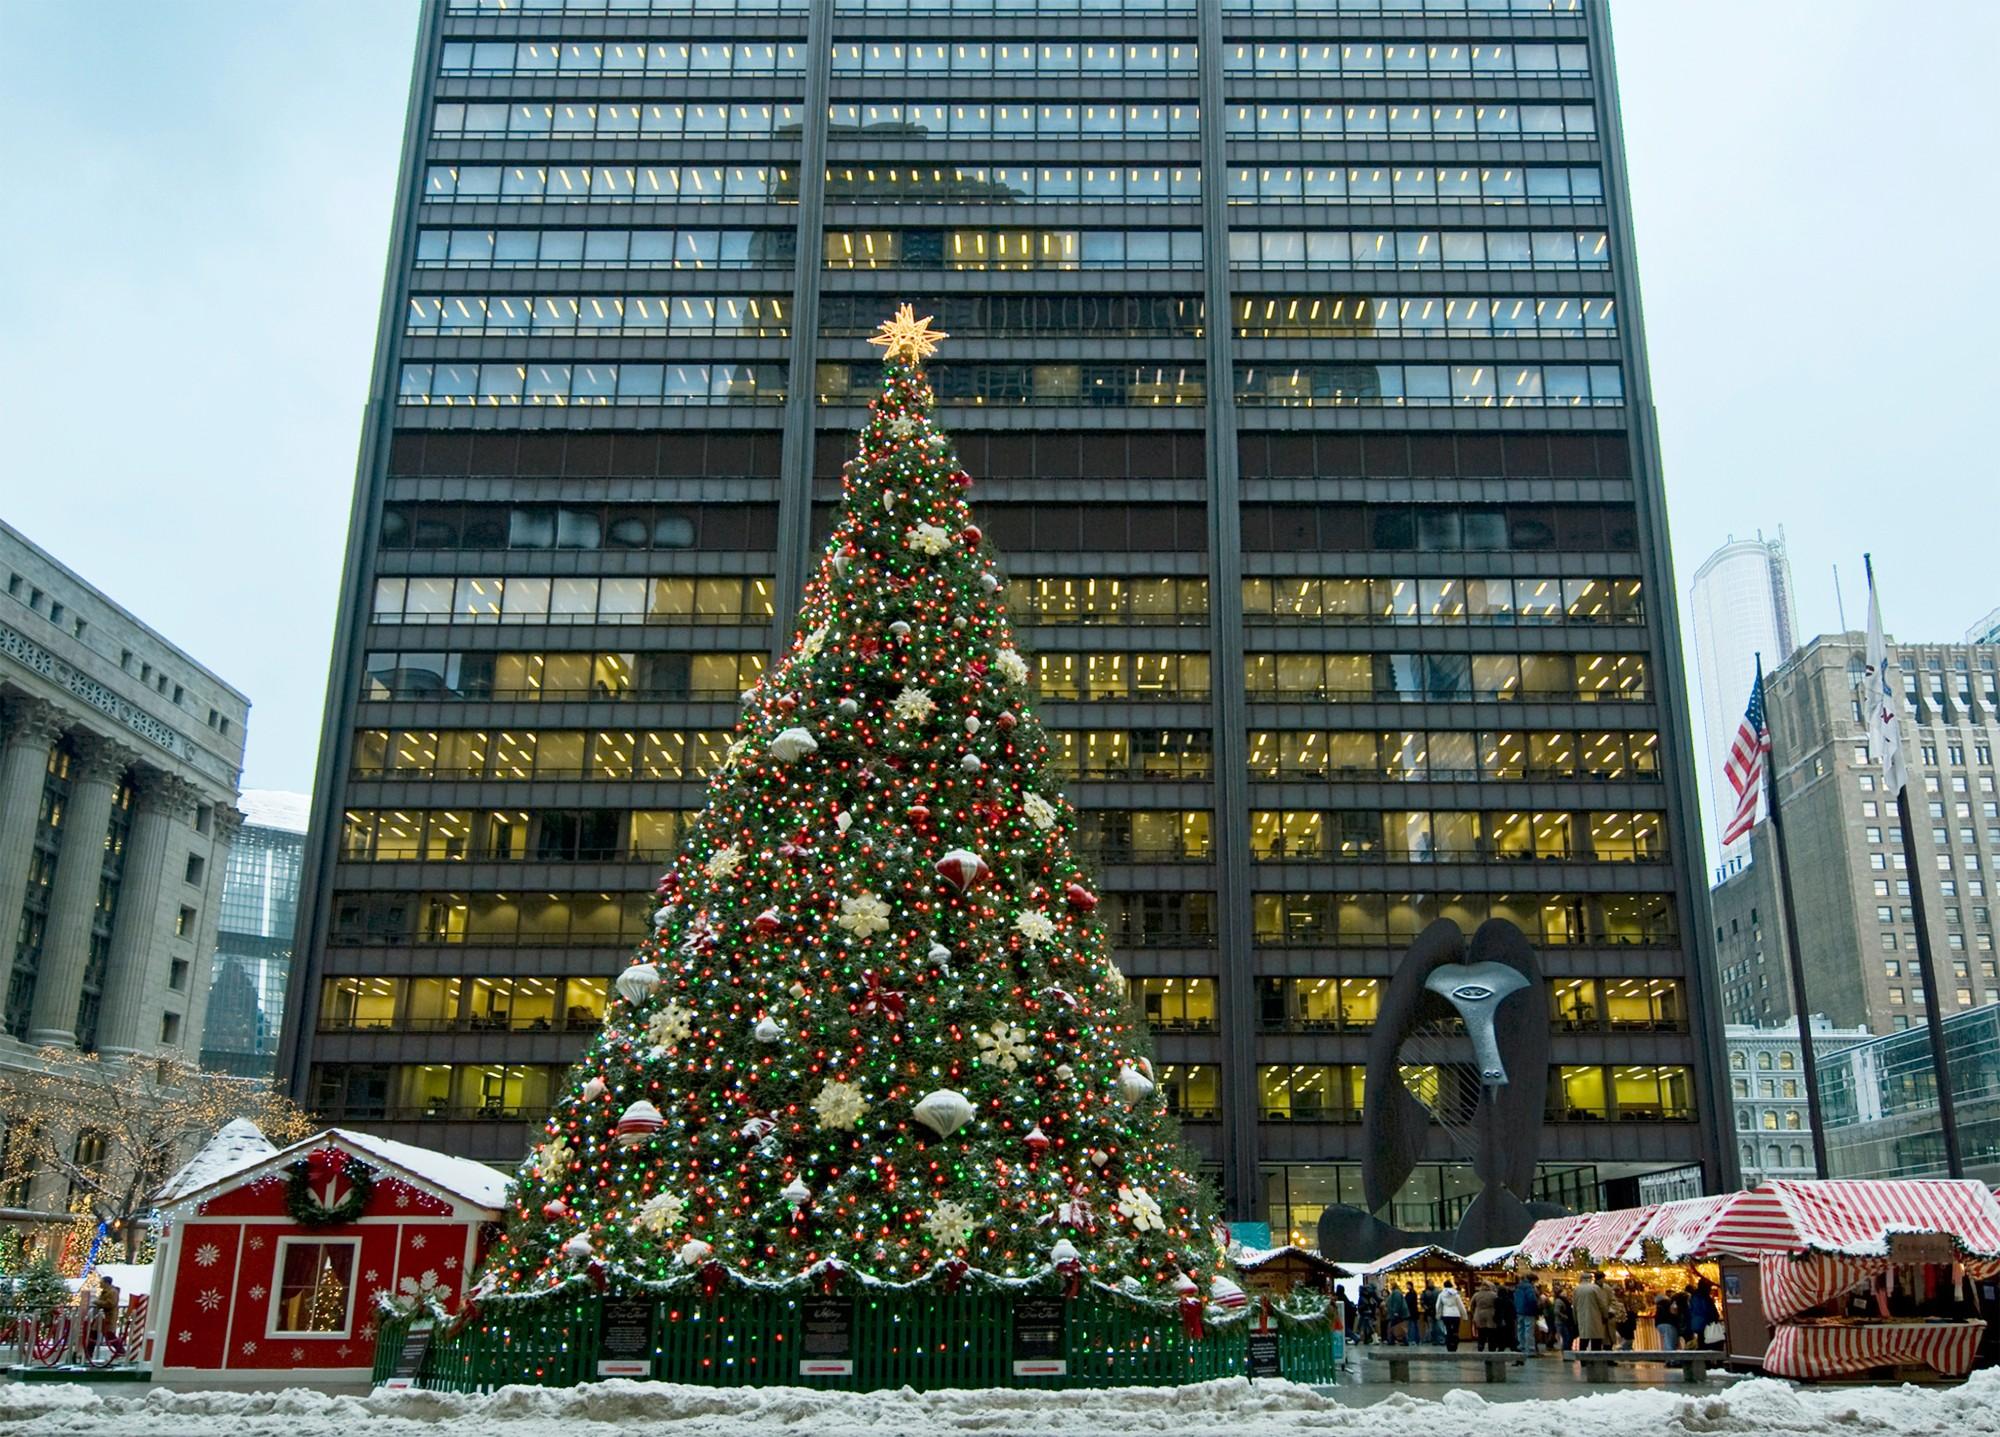 Downtown Chicago Christmas Lights